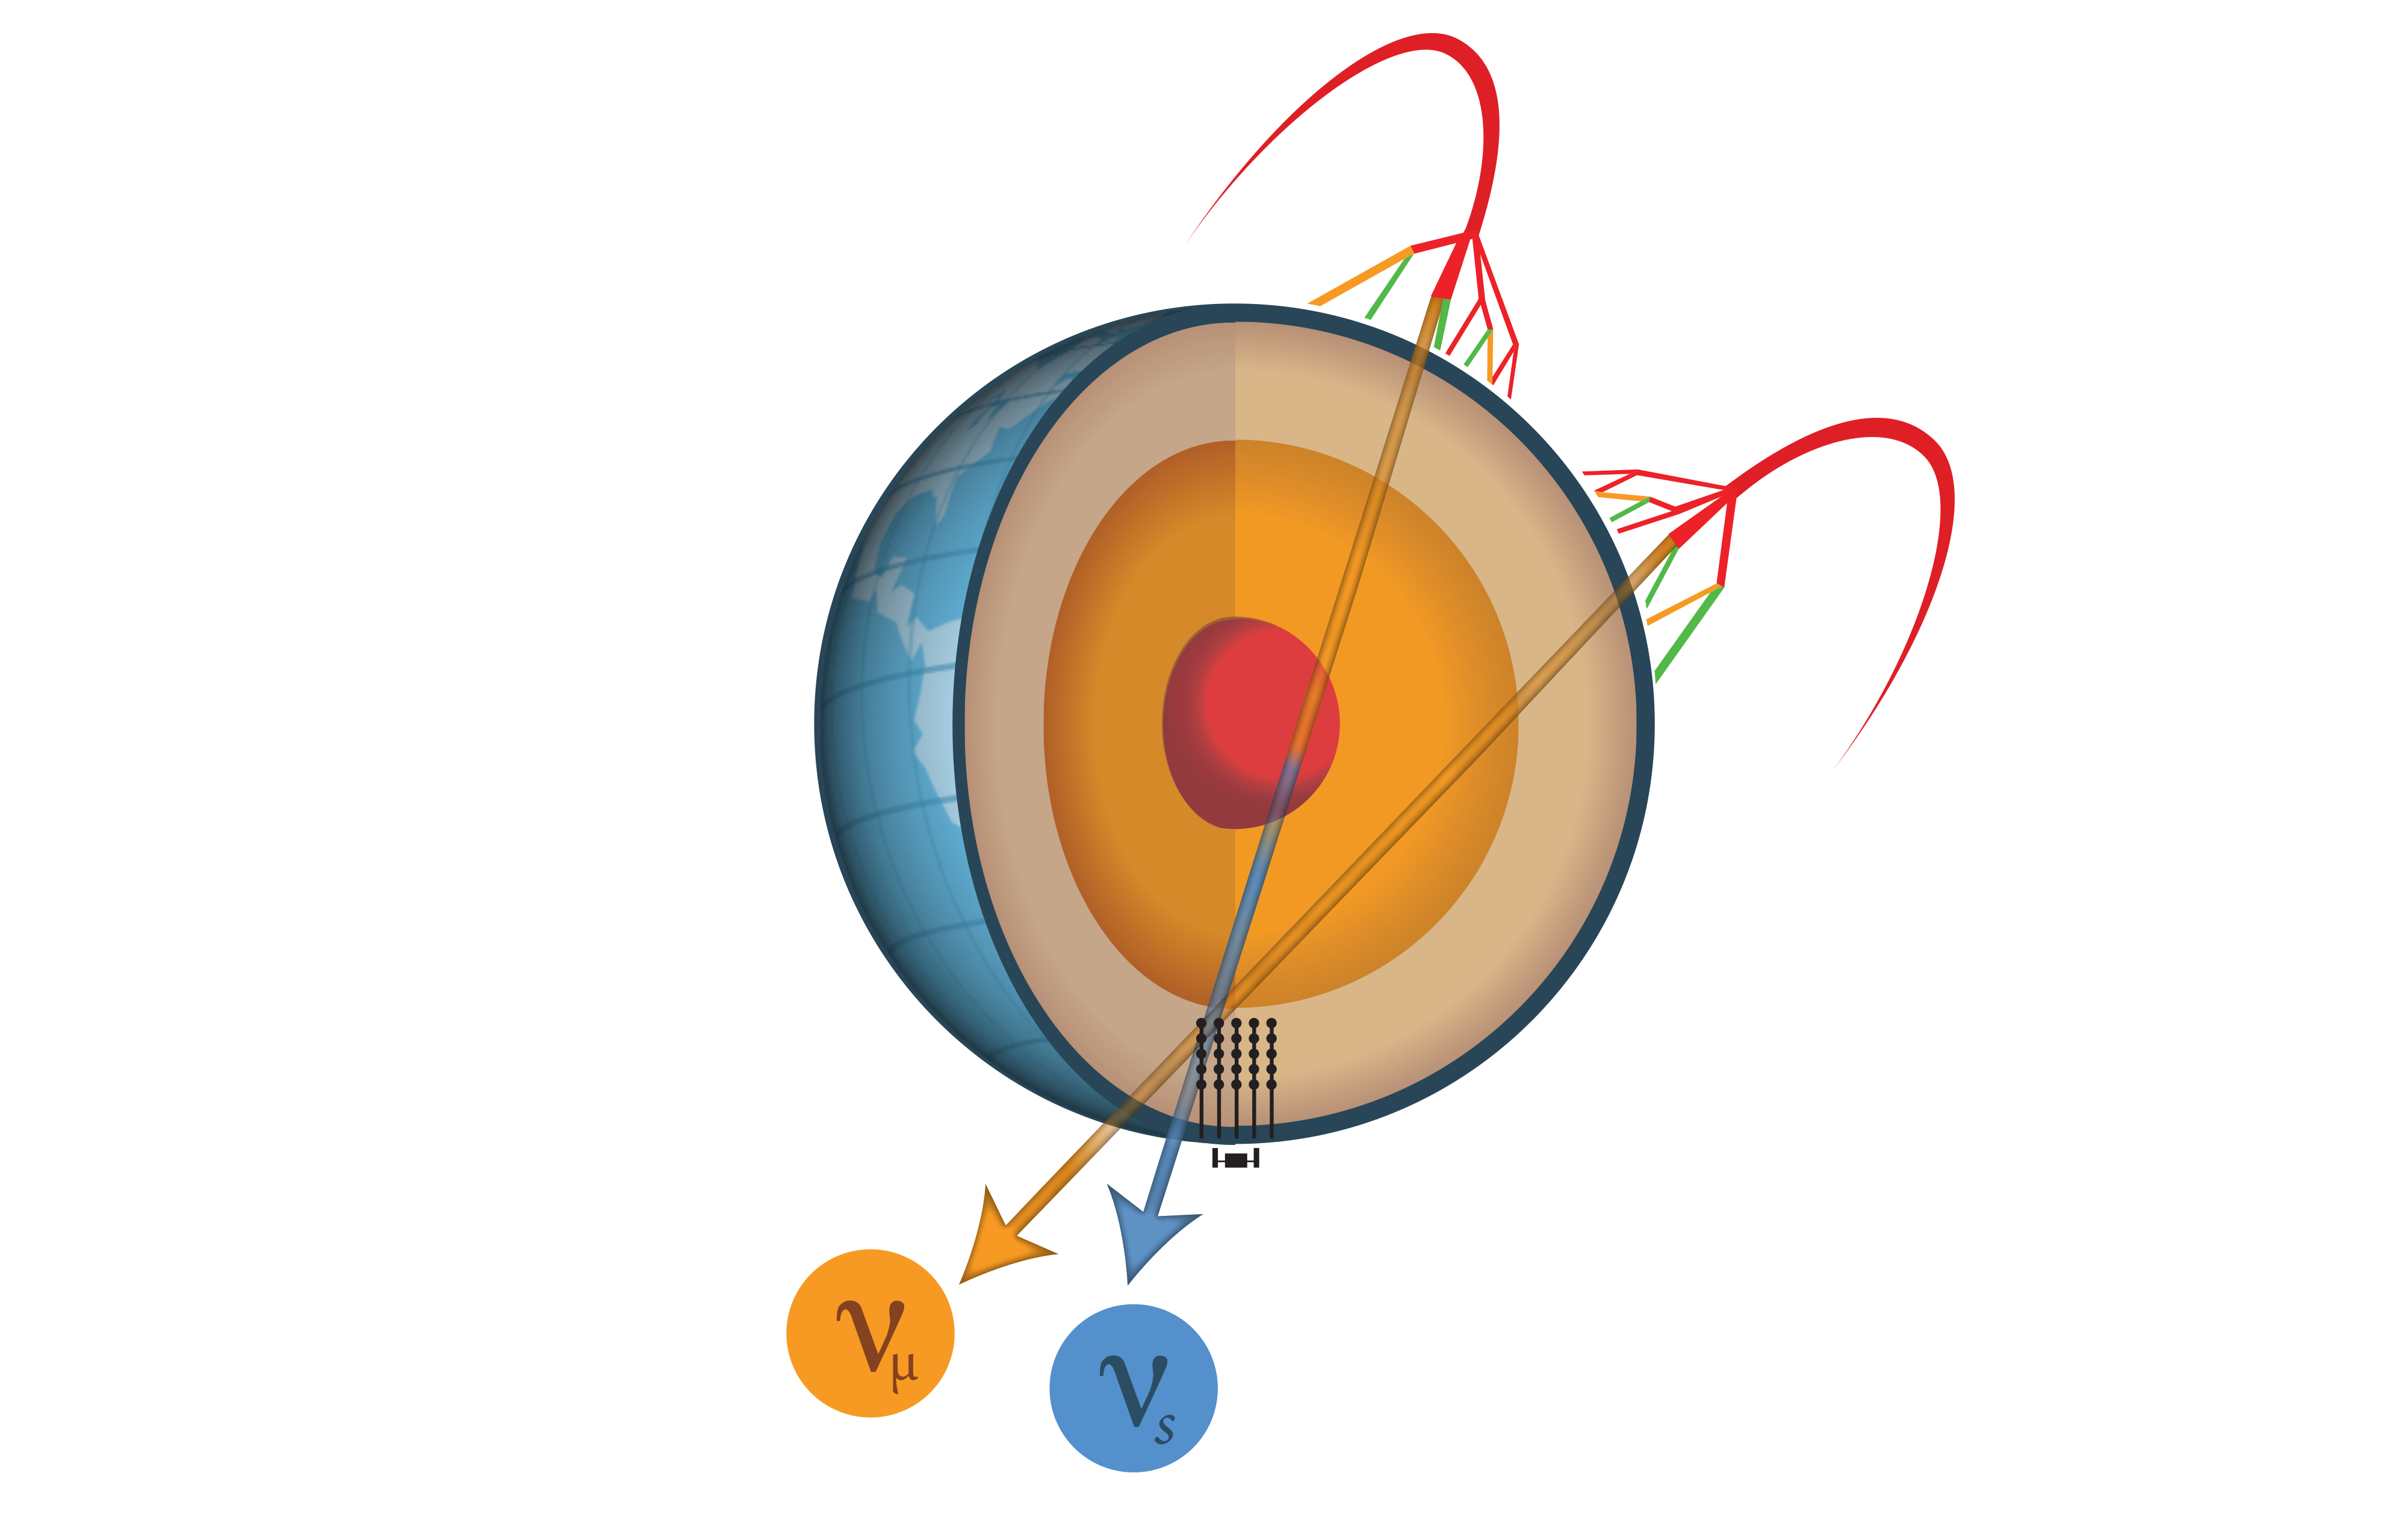 Sterile neutrinos through Earth's core